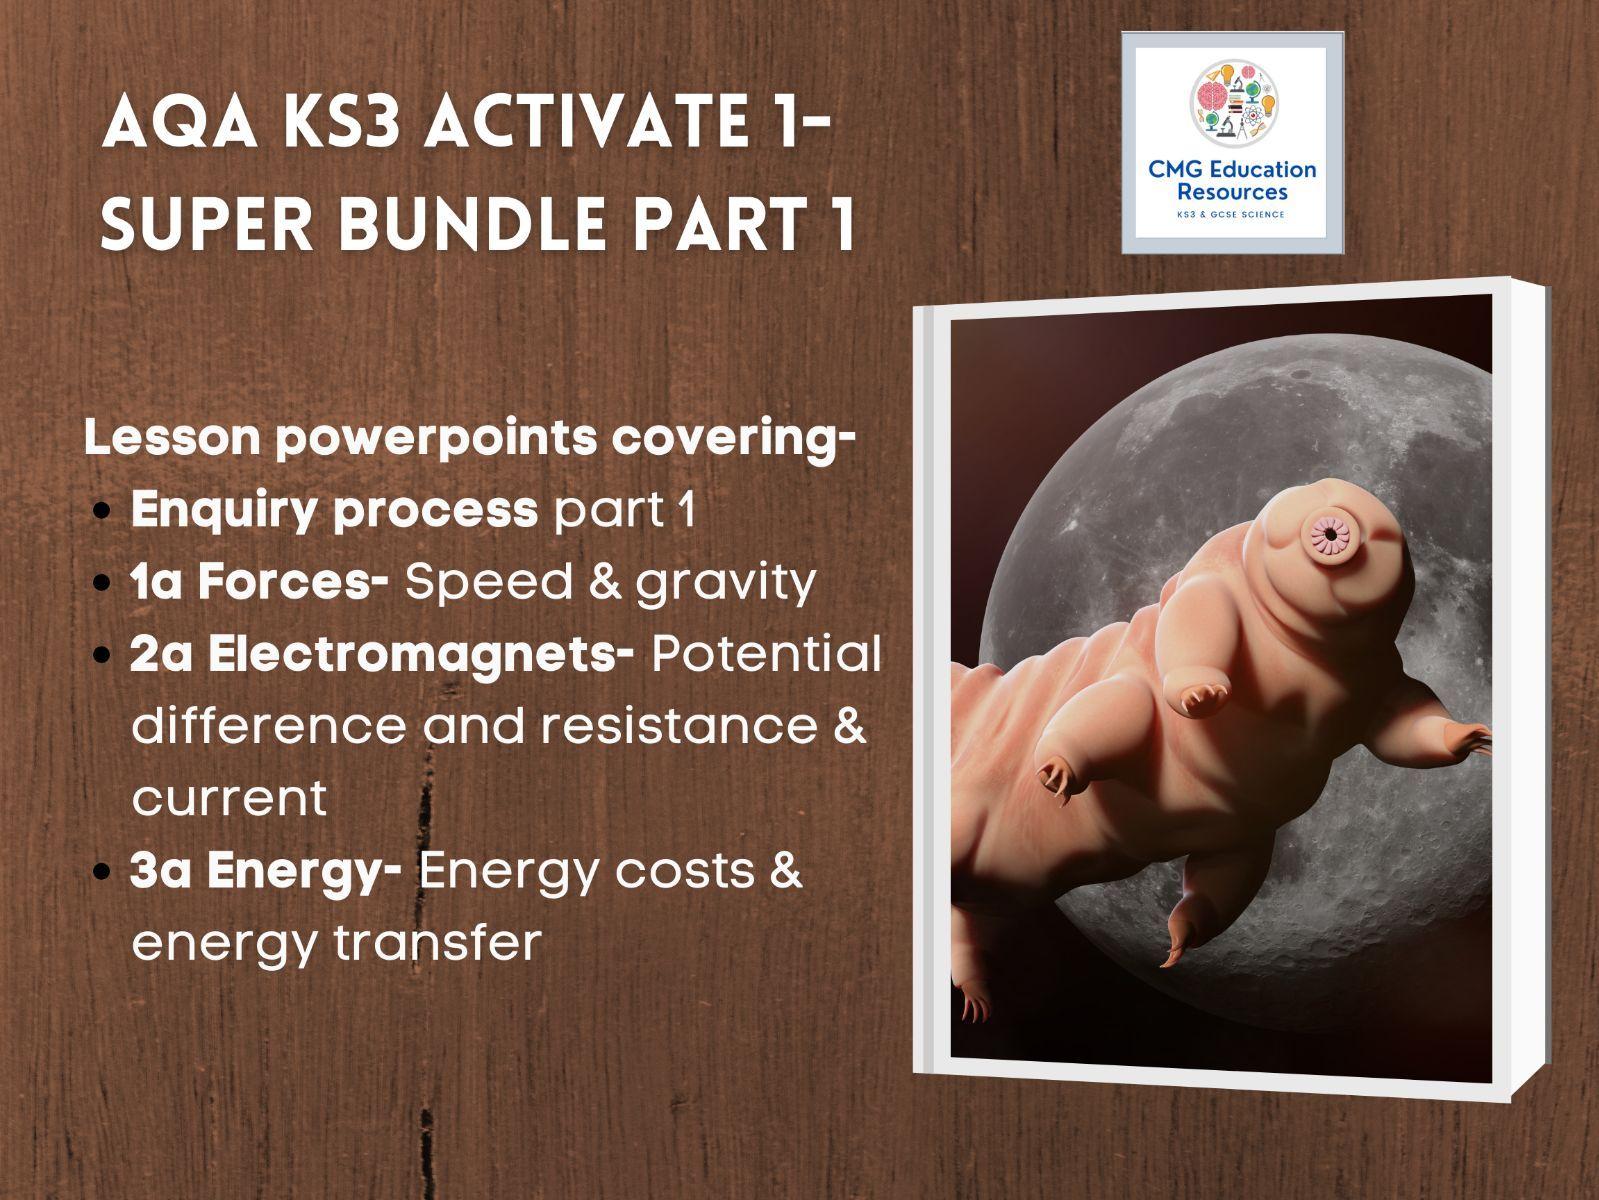 KS3 AQA Activate 1- Super bundle part 1